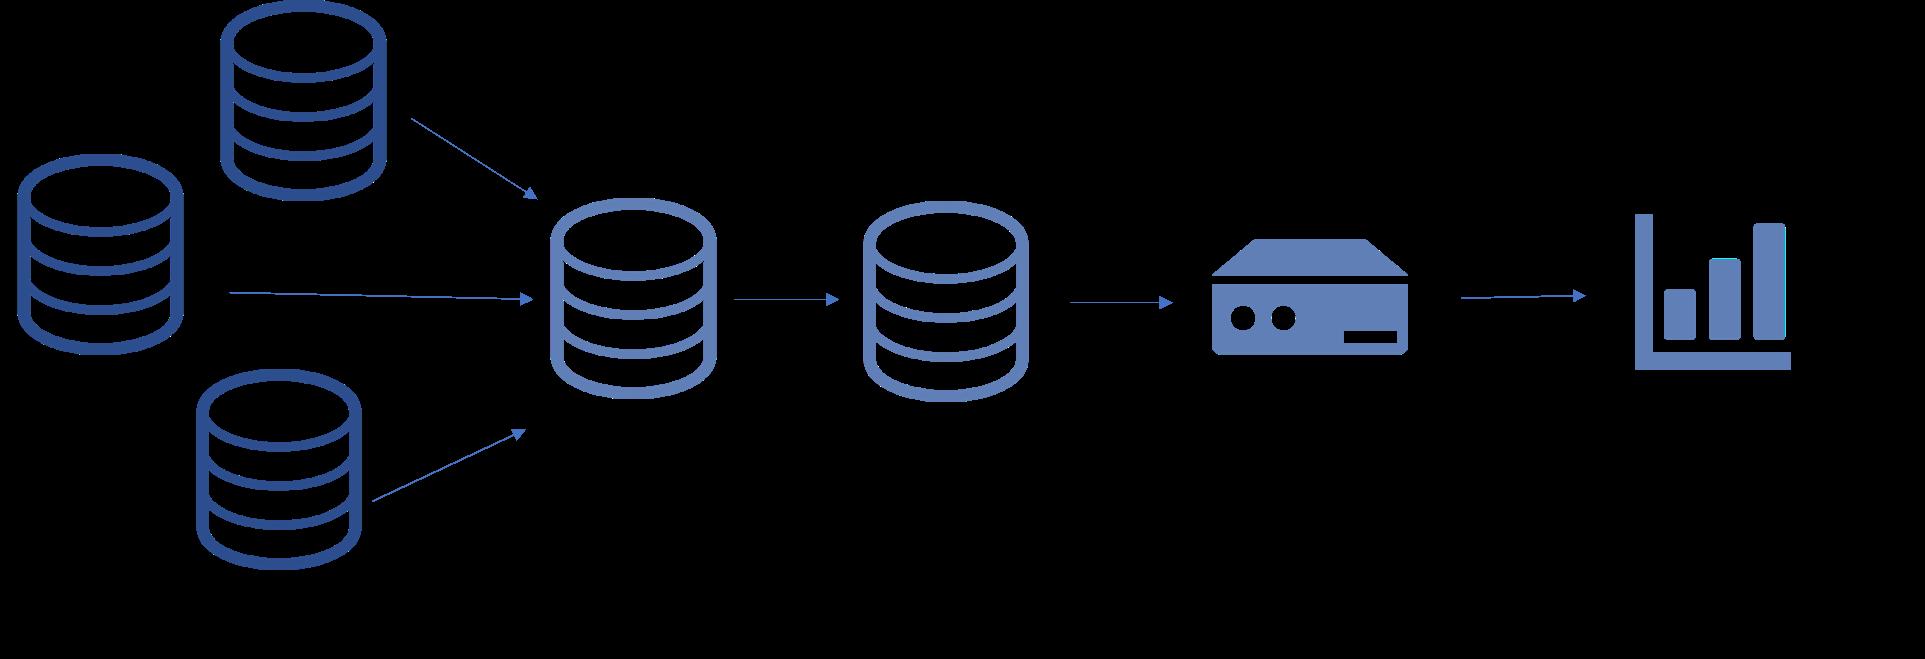 ETL+Tableauデータ統合プランイメージ図